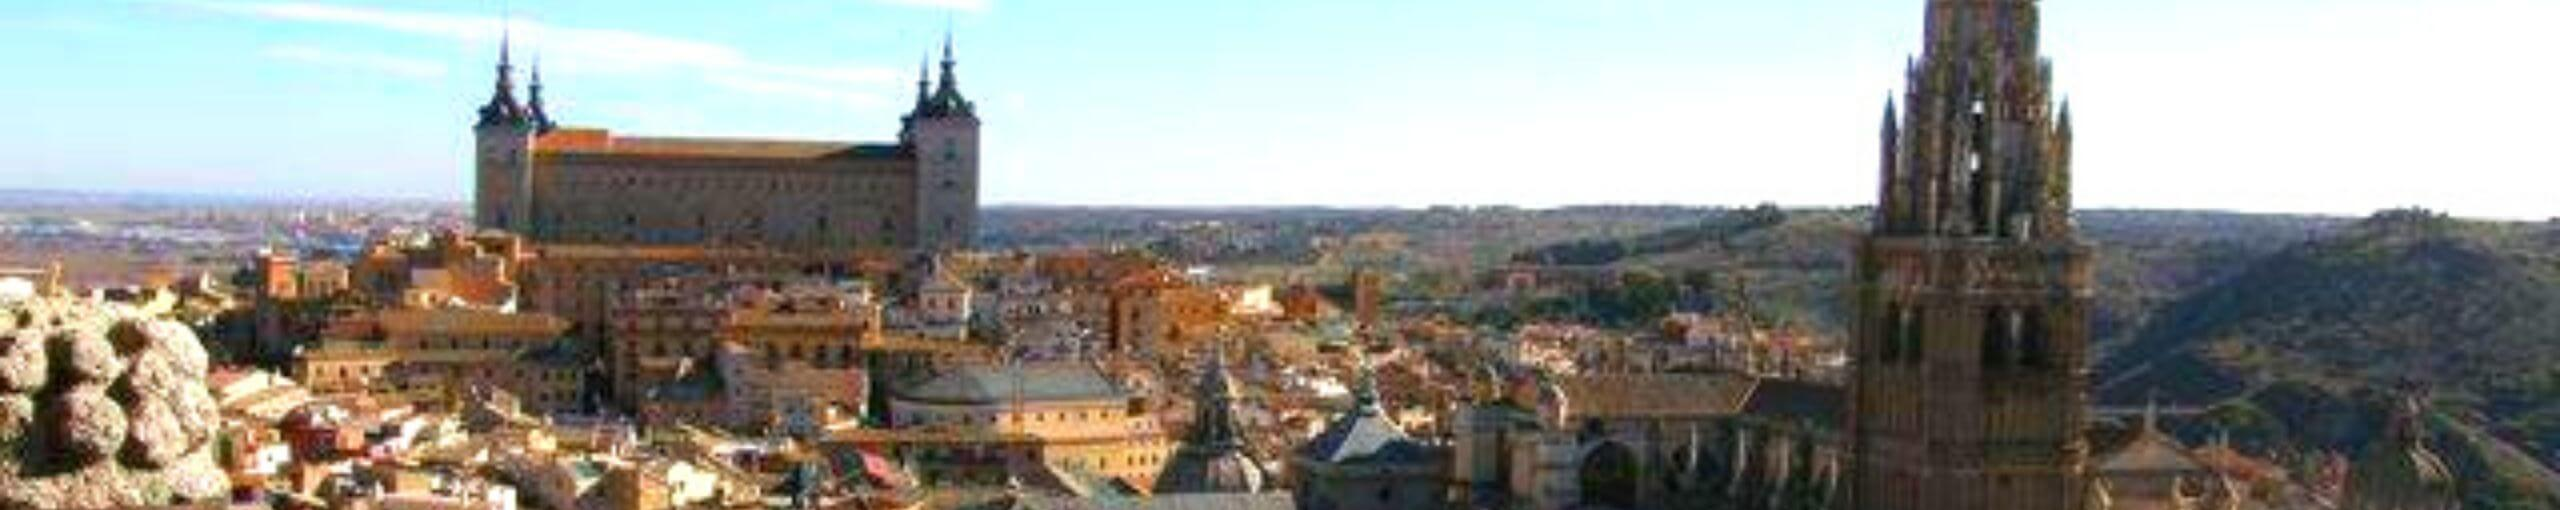 Viajar a España, Panorámica de Toledo. Castilla la Mancha.